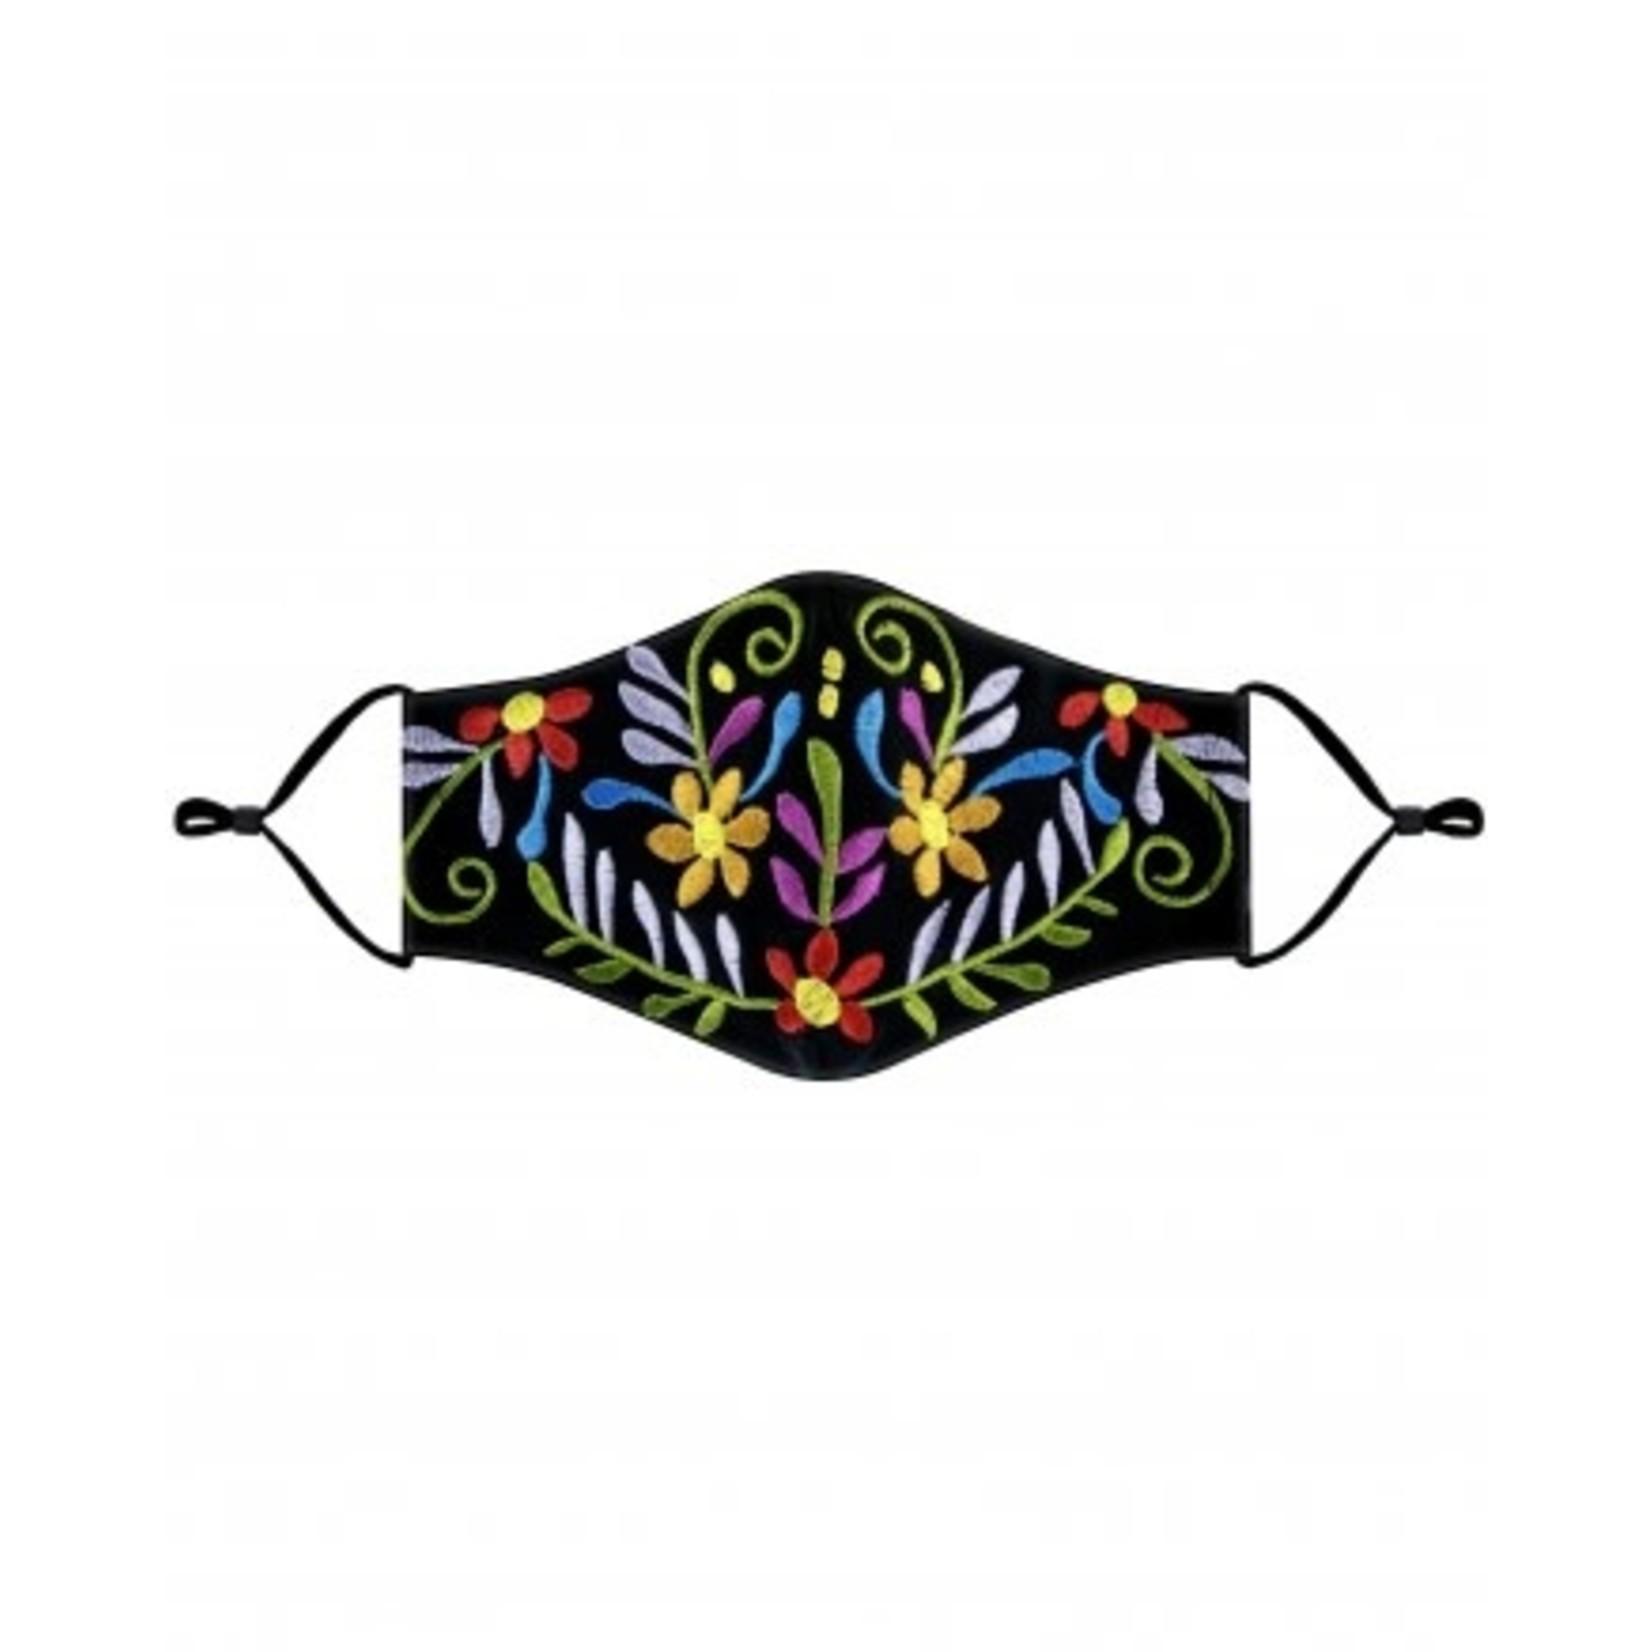 Embroidered black mask